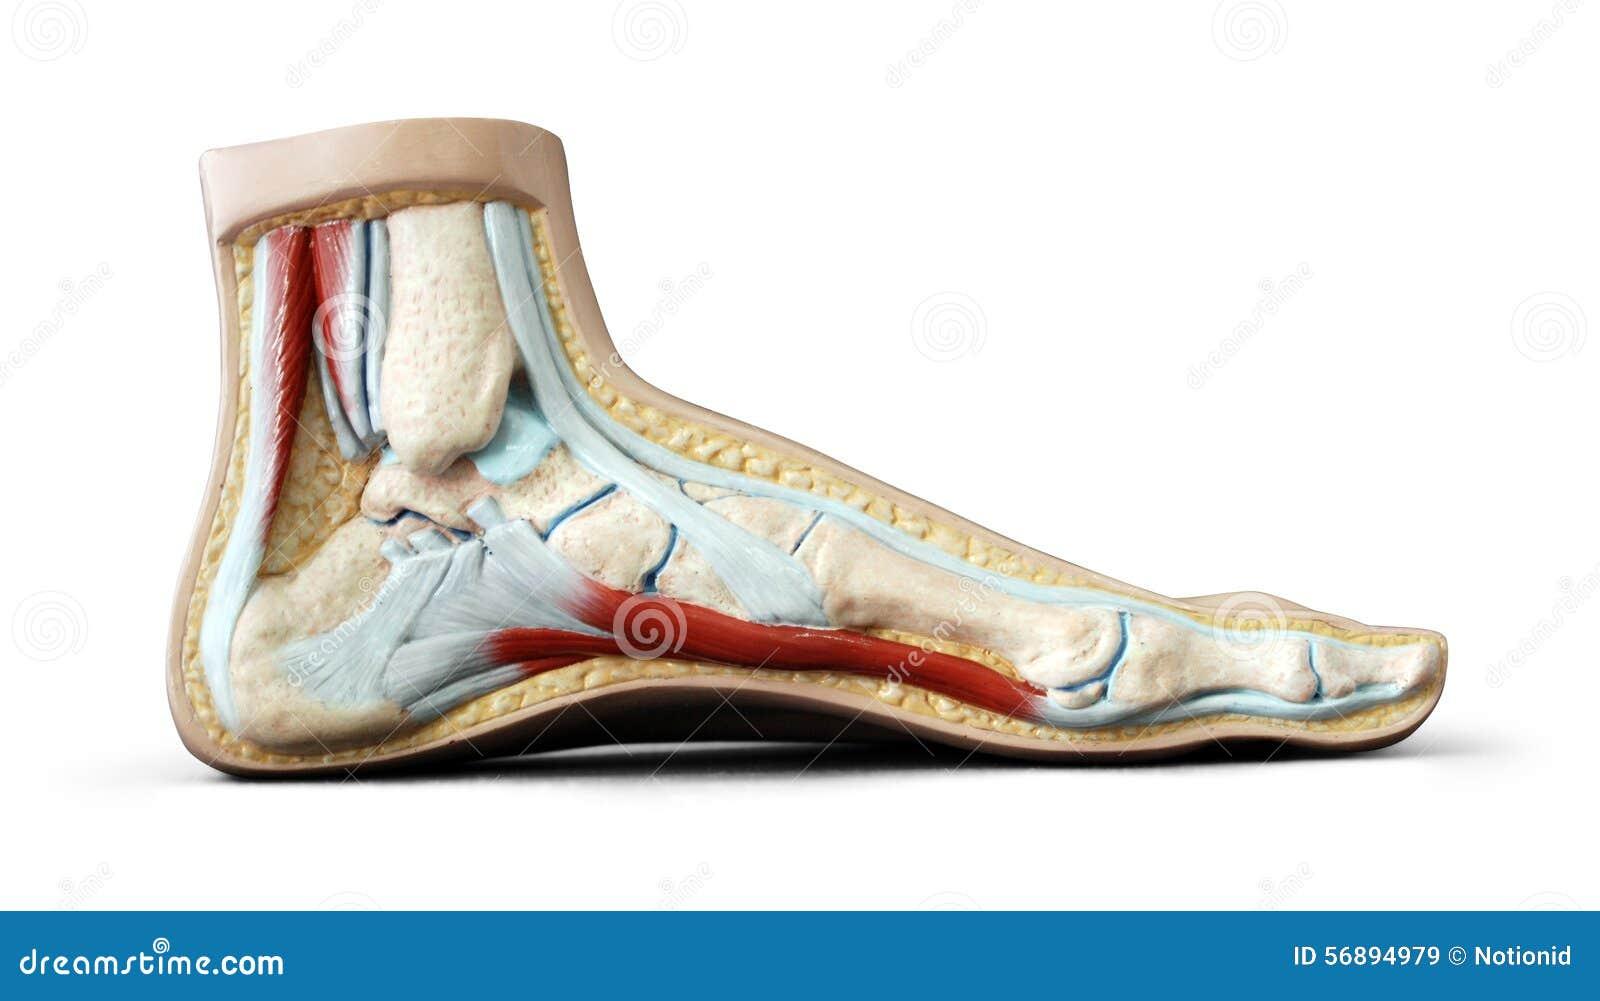 Foot Anatomy Stock Image Image Of Toes Skeleton Finger 56894979